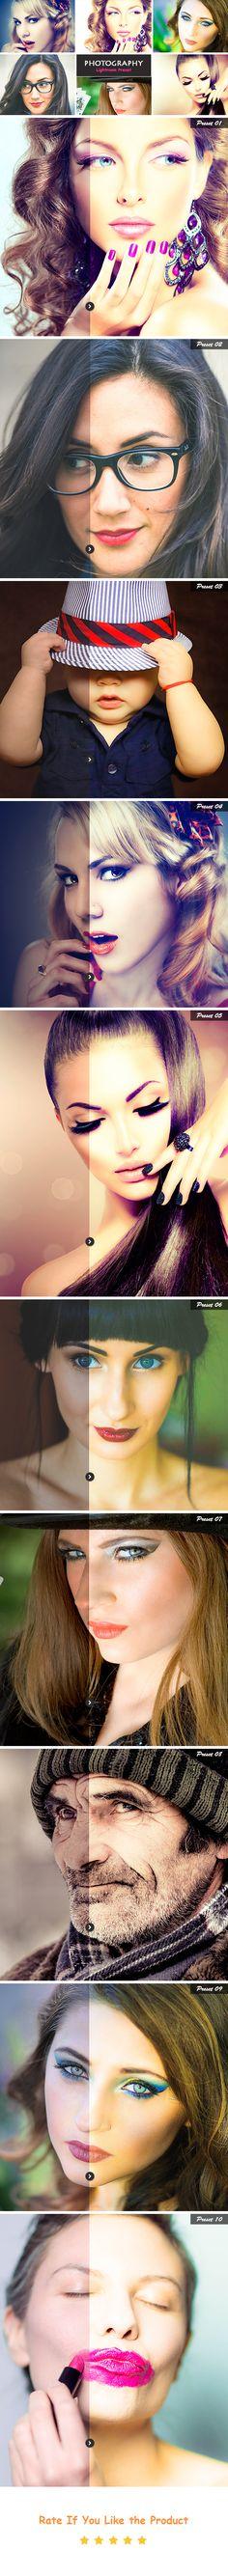 Photography Lightroom Preset. Download here: http://graphicriver.net/item/photography-lightroom-preset/16282012?ref=ksioks